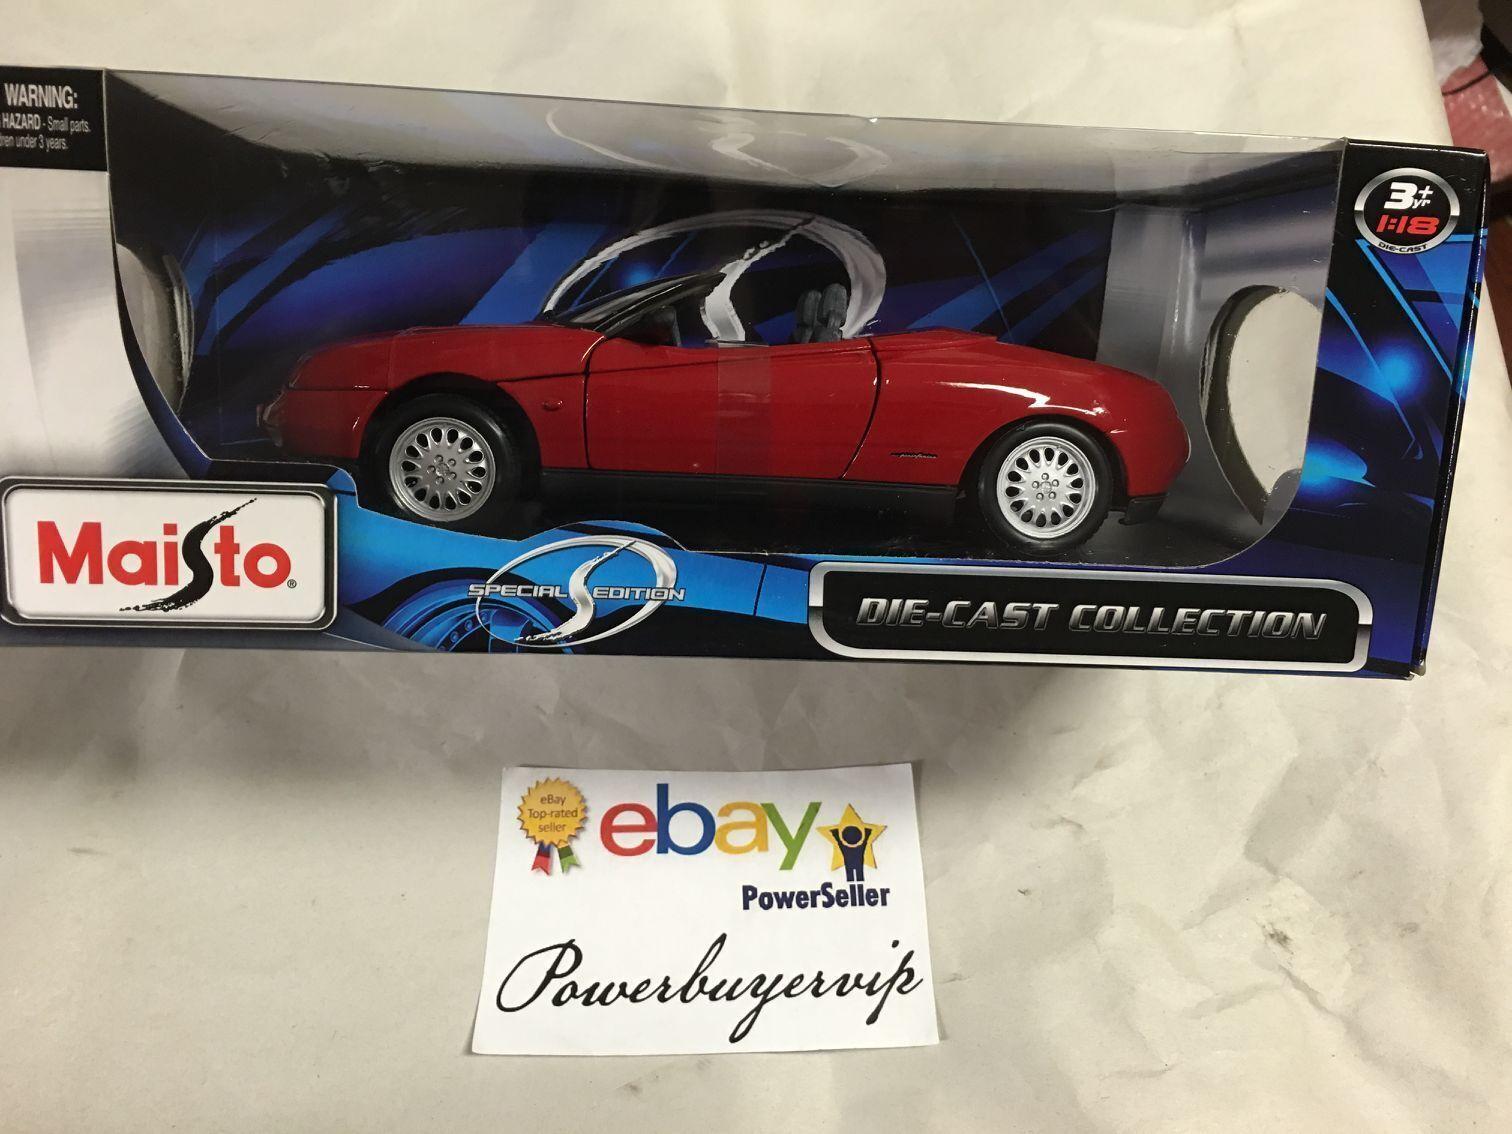 NEW Maisto 1:18 Special Edition Alfa Romeo Spider 1995 Mode Car, Red 2 DAY GET